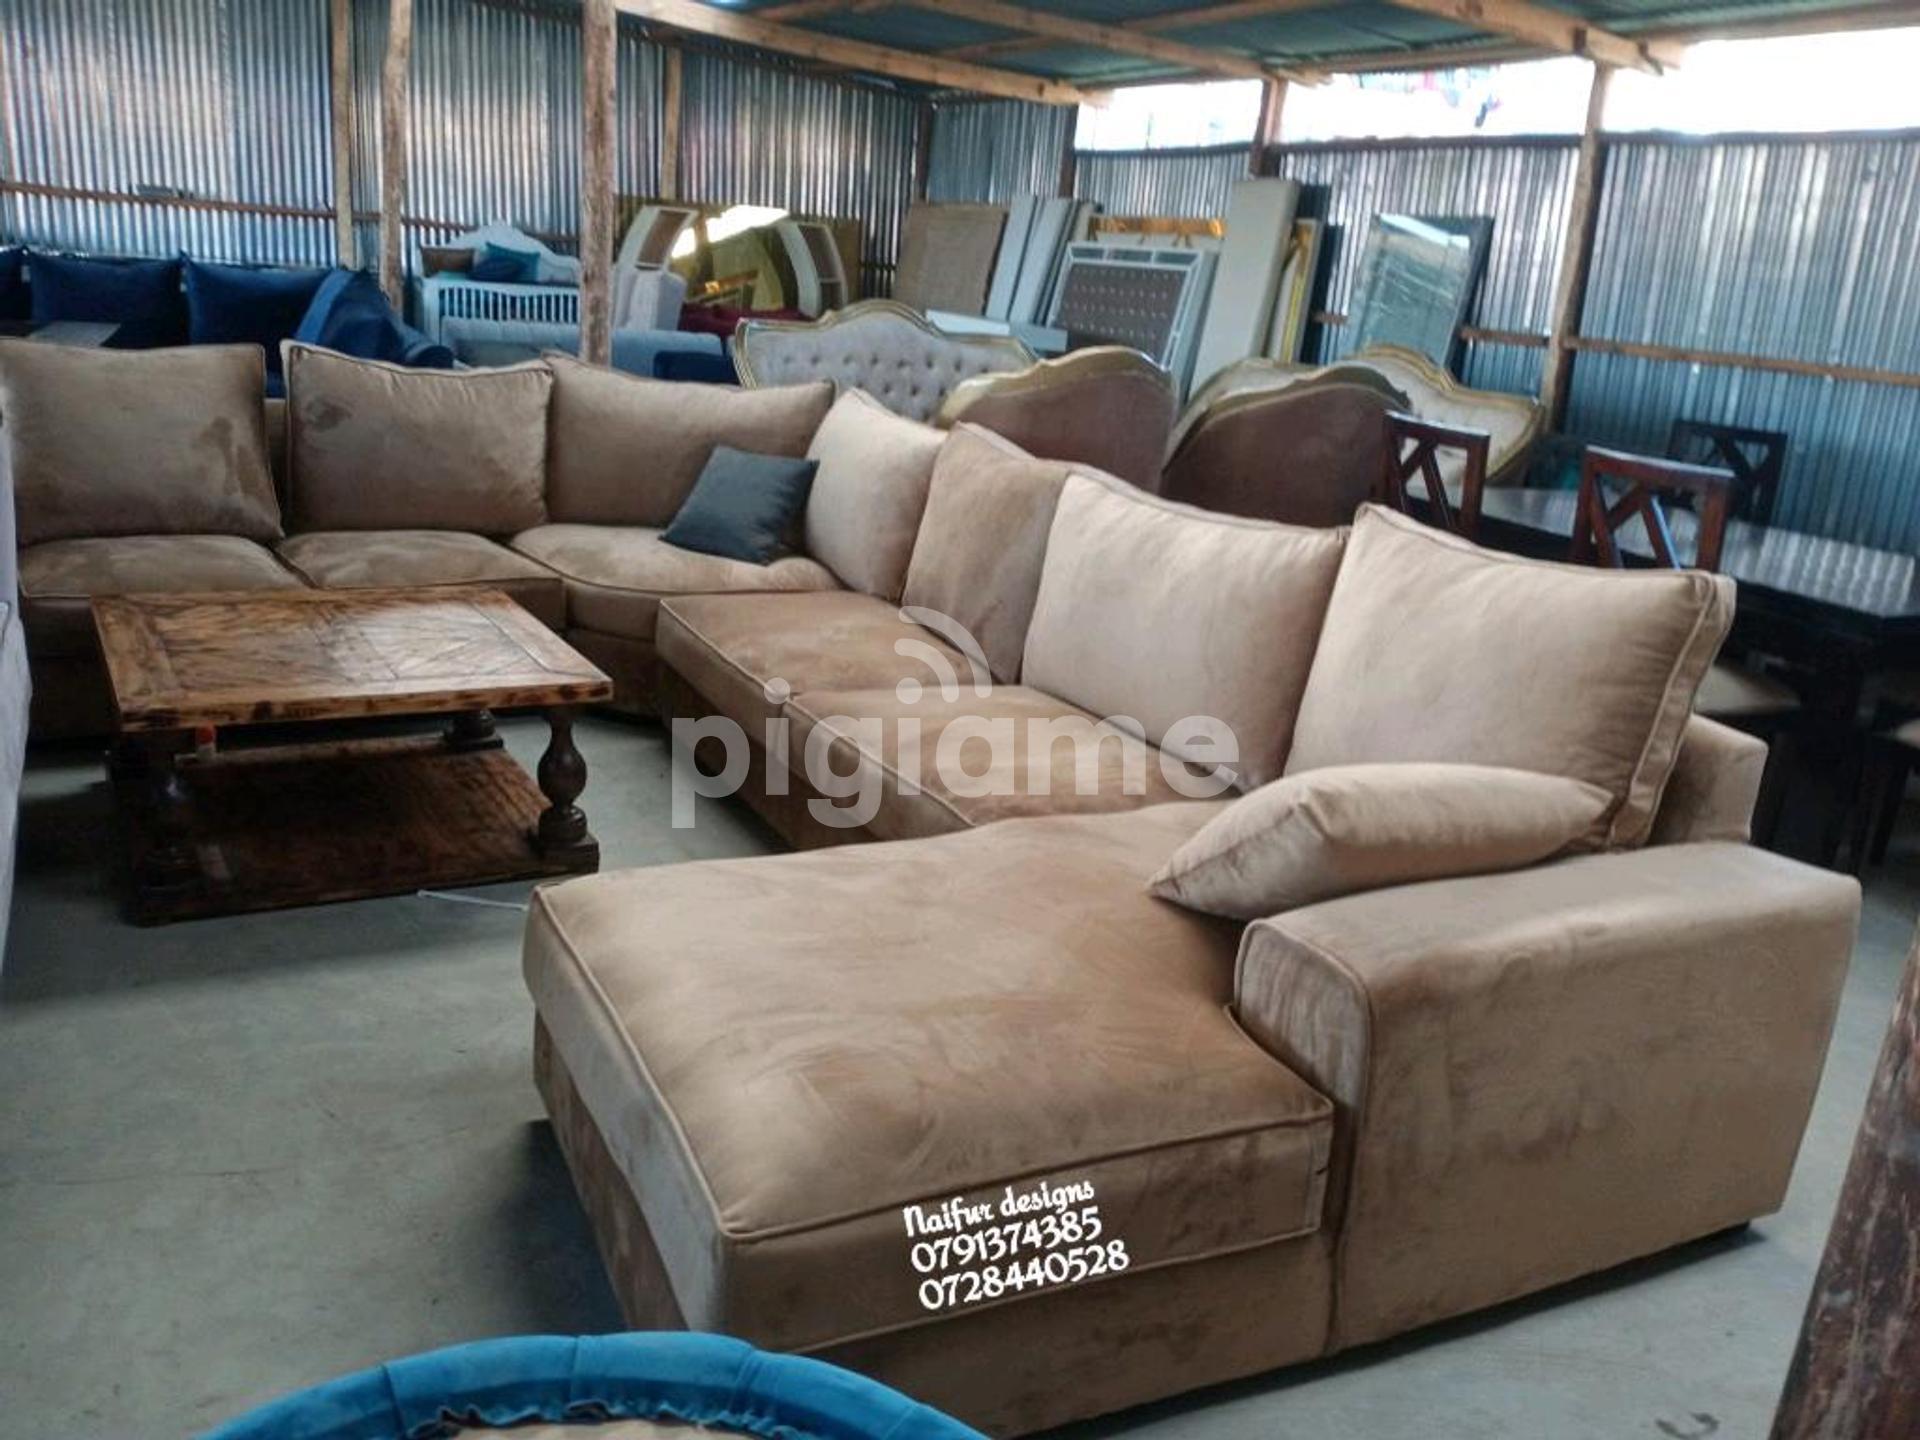 Picture of: Ten Seater Sofa U Shaped Sofa Brown Sofas L Shaped Sofas In Nairobi Pigiame